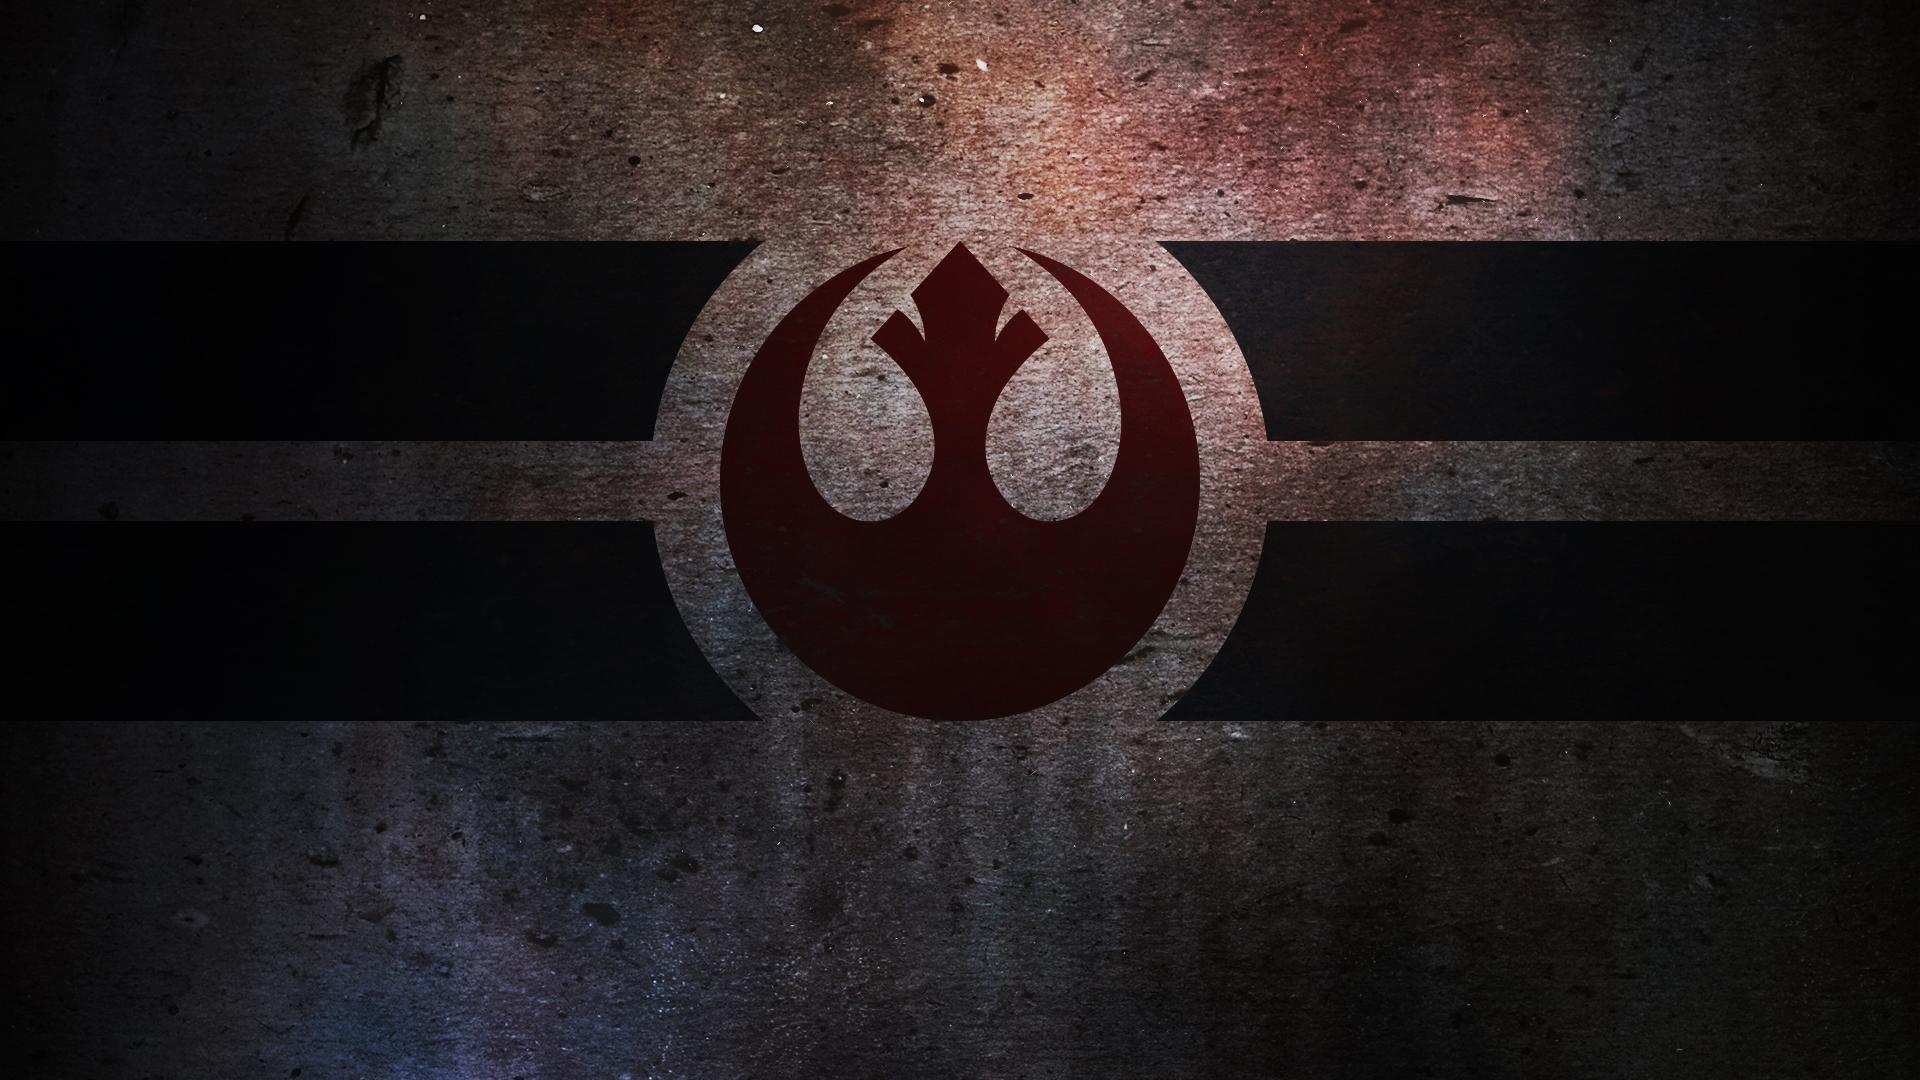 rebel alliance full hd fond d'écran and arrière-plan   1920x1080